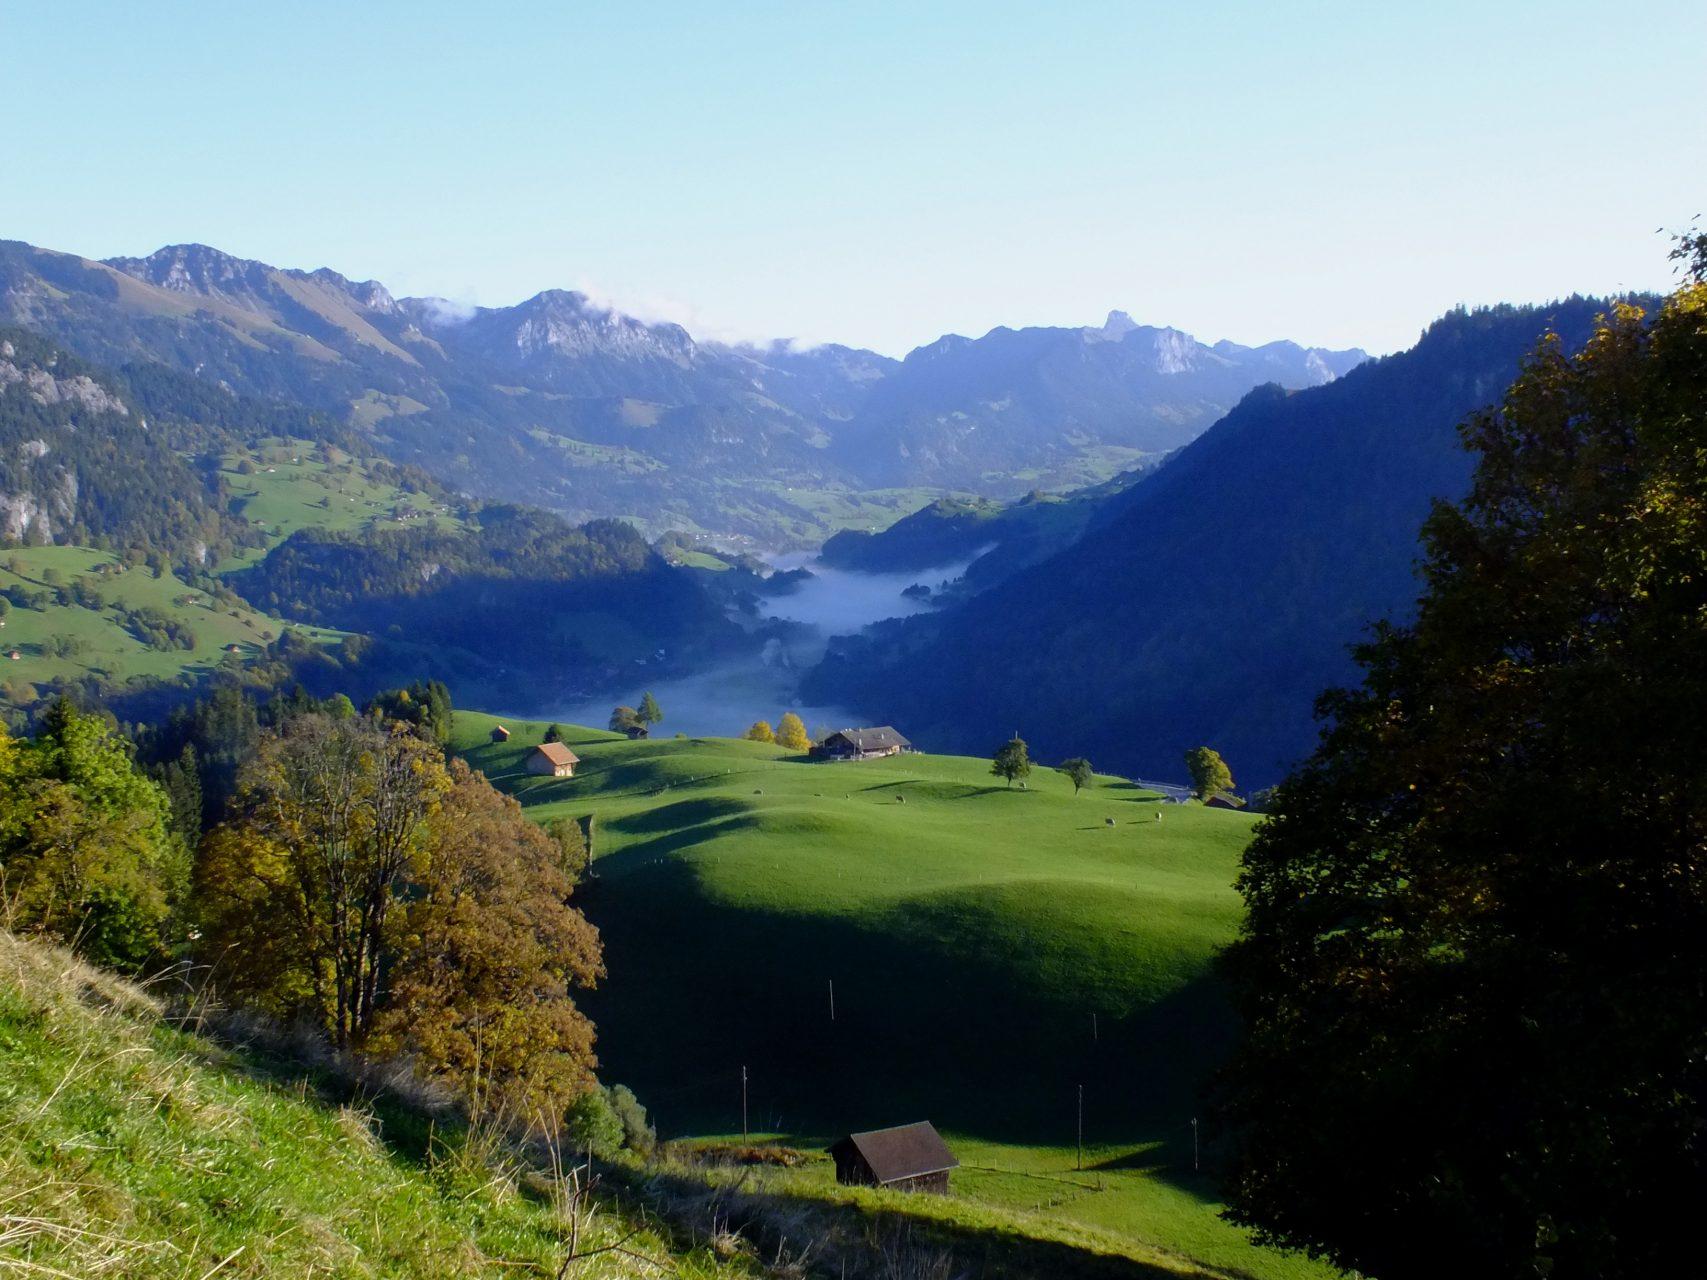 Landschaften im Berner Oberland